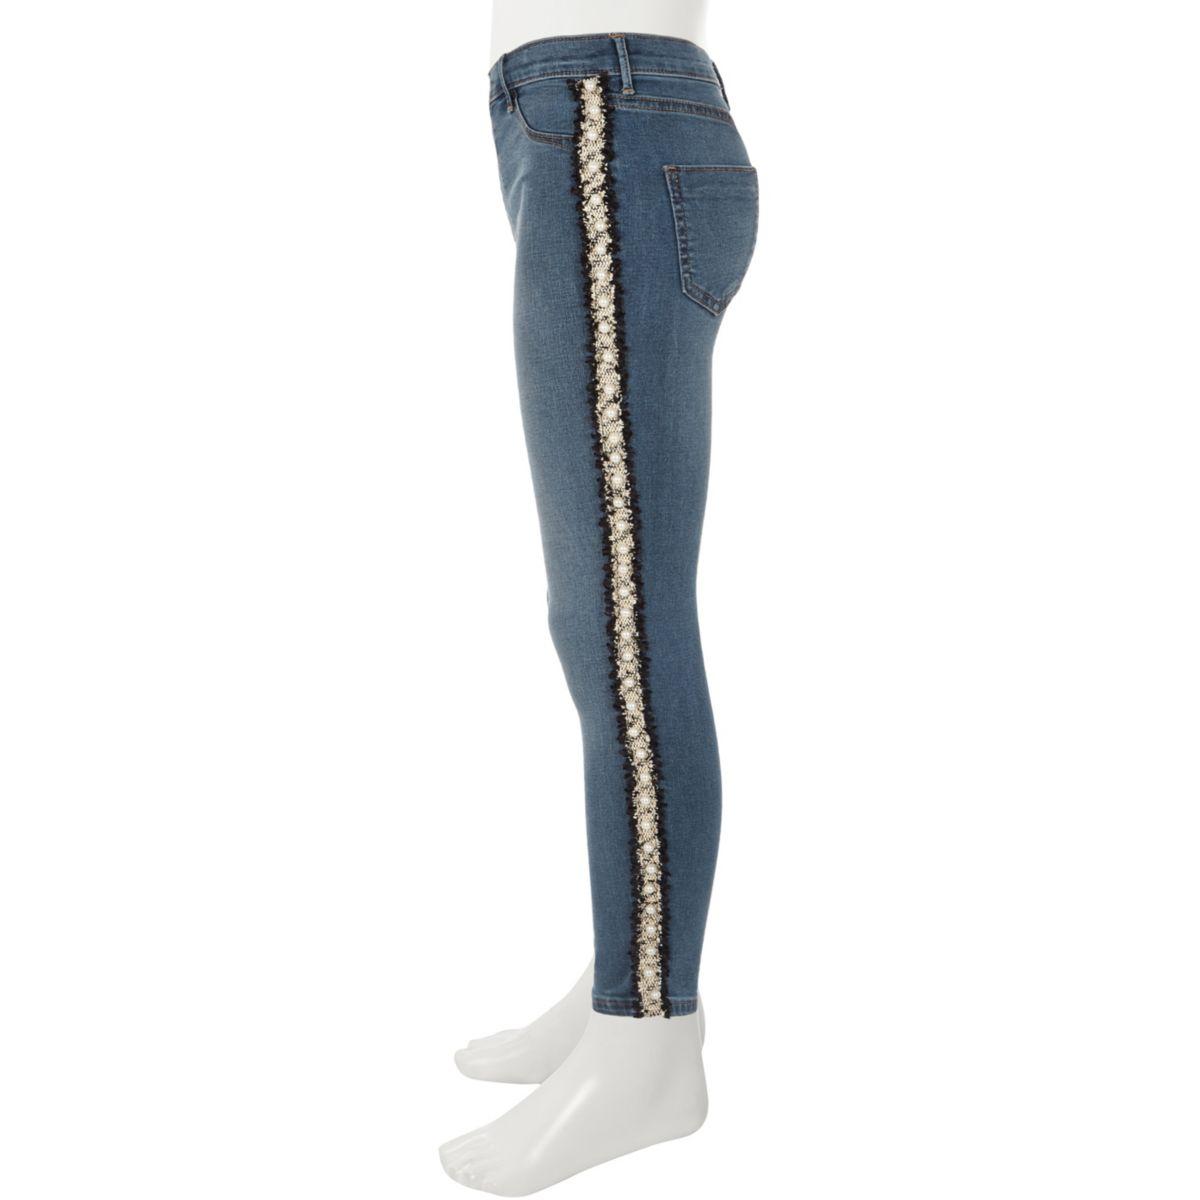 Molly – Jean bleu moyen à bandes latérales ornées de perles fille